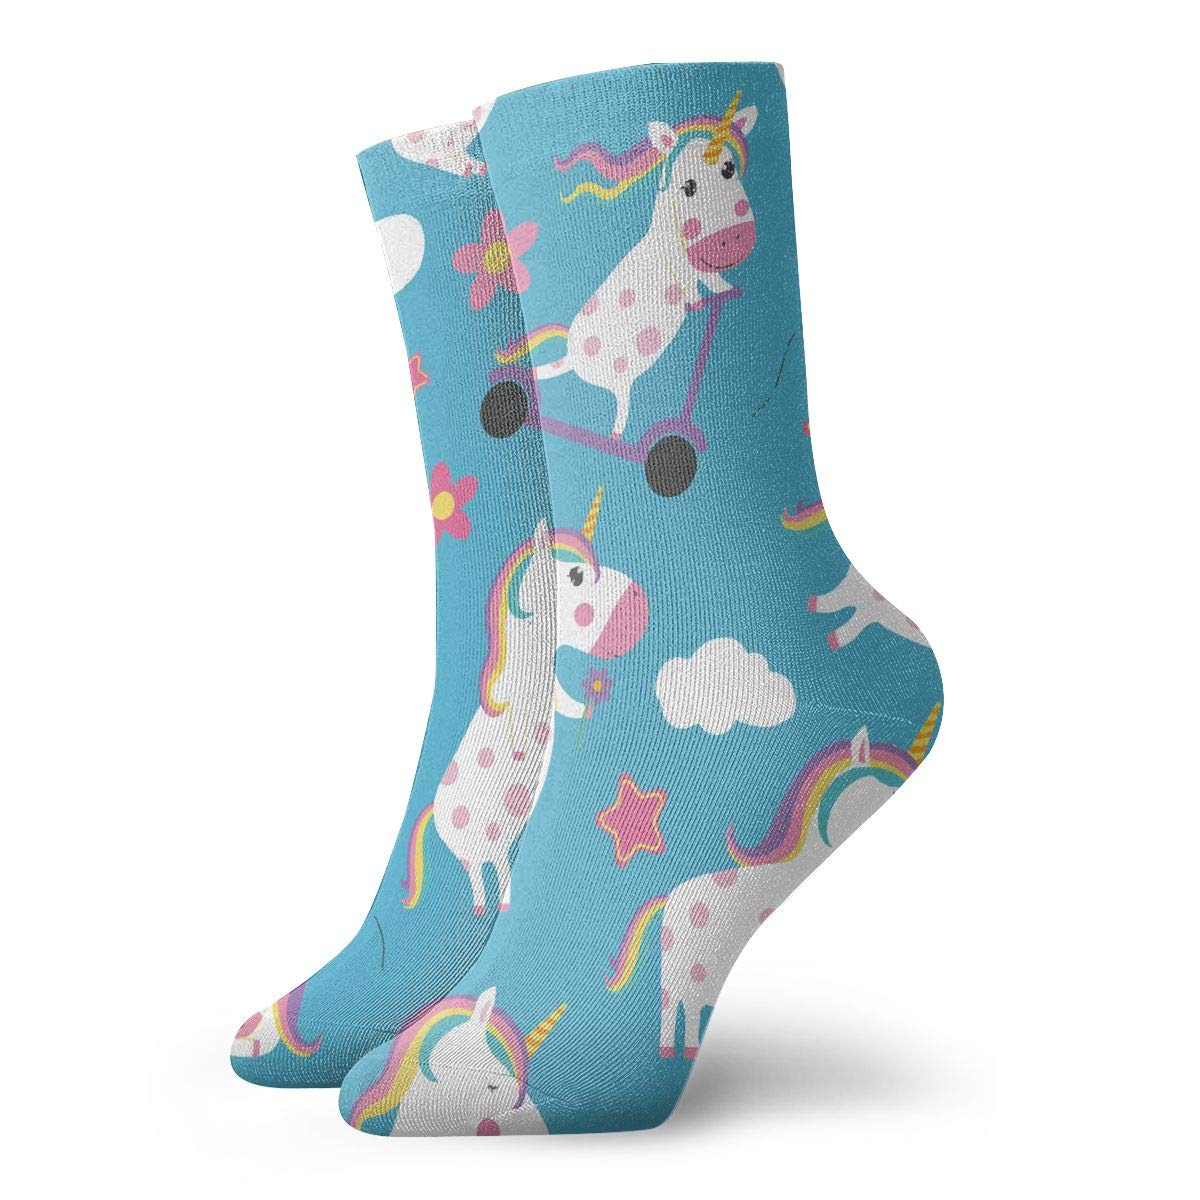 Mens Fashion Performance Polyester Socks Blue Happy Unicorns And Flower Casual Athletic Crew Socks.